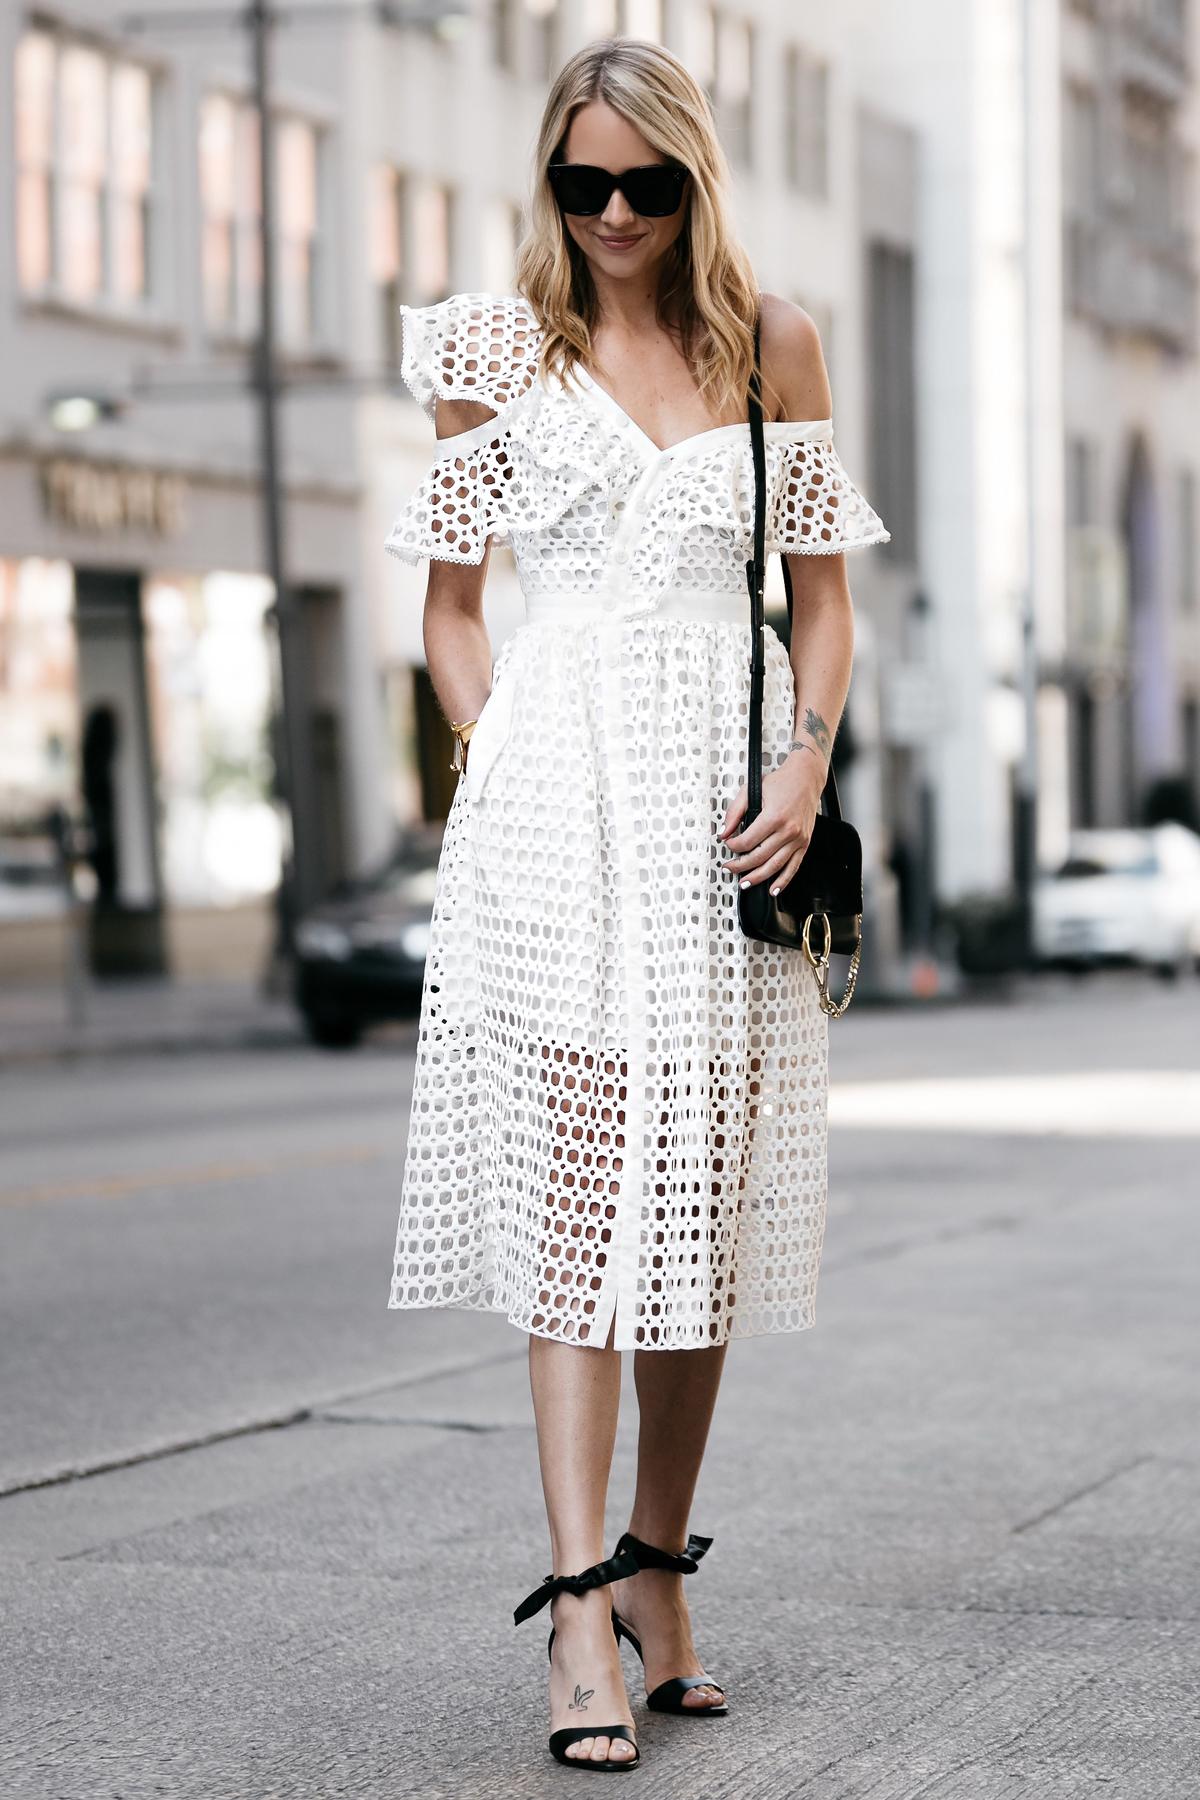 Fashion Jackson, Dallas Blogger, Fashion Blogger, Street Style, Self-Portrait White Lace Ruffle Sleeve Midi Dress, Chloe Faye Black Handbag, Black Ankle Strap Bow Heels